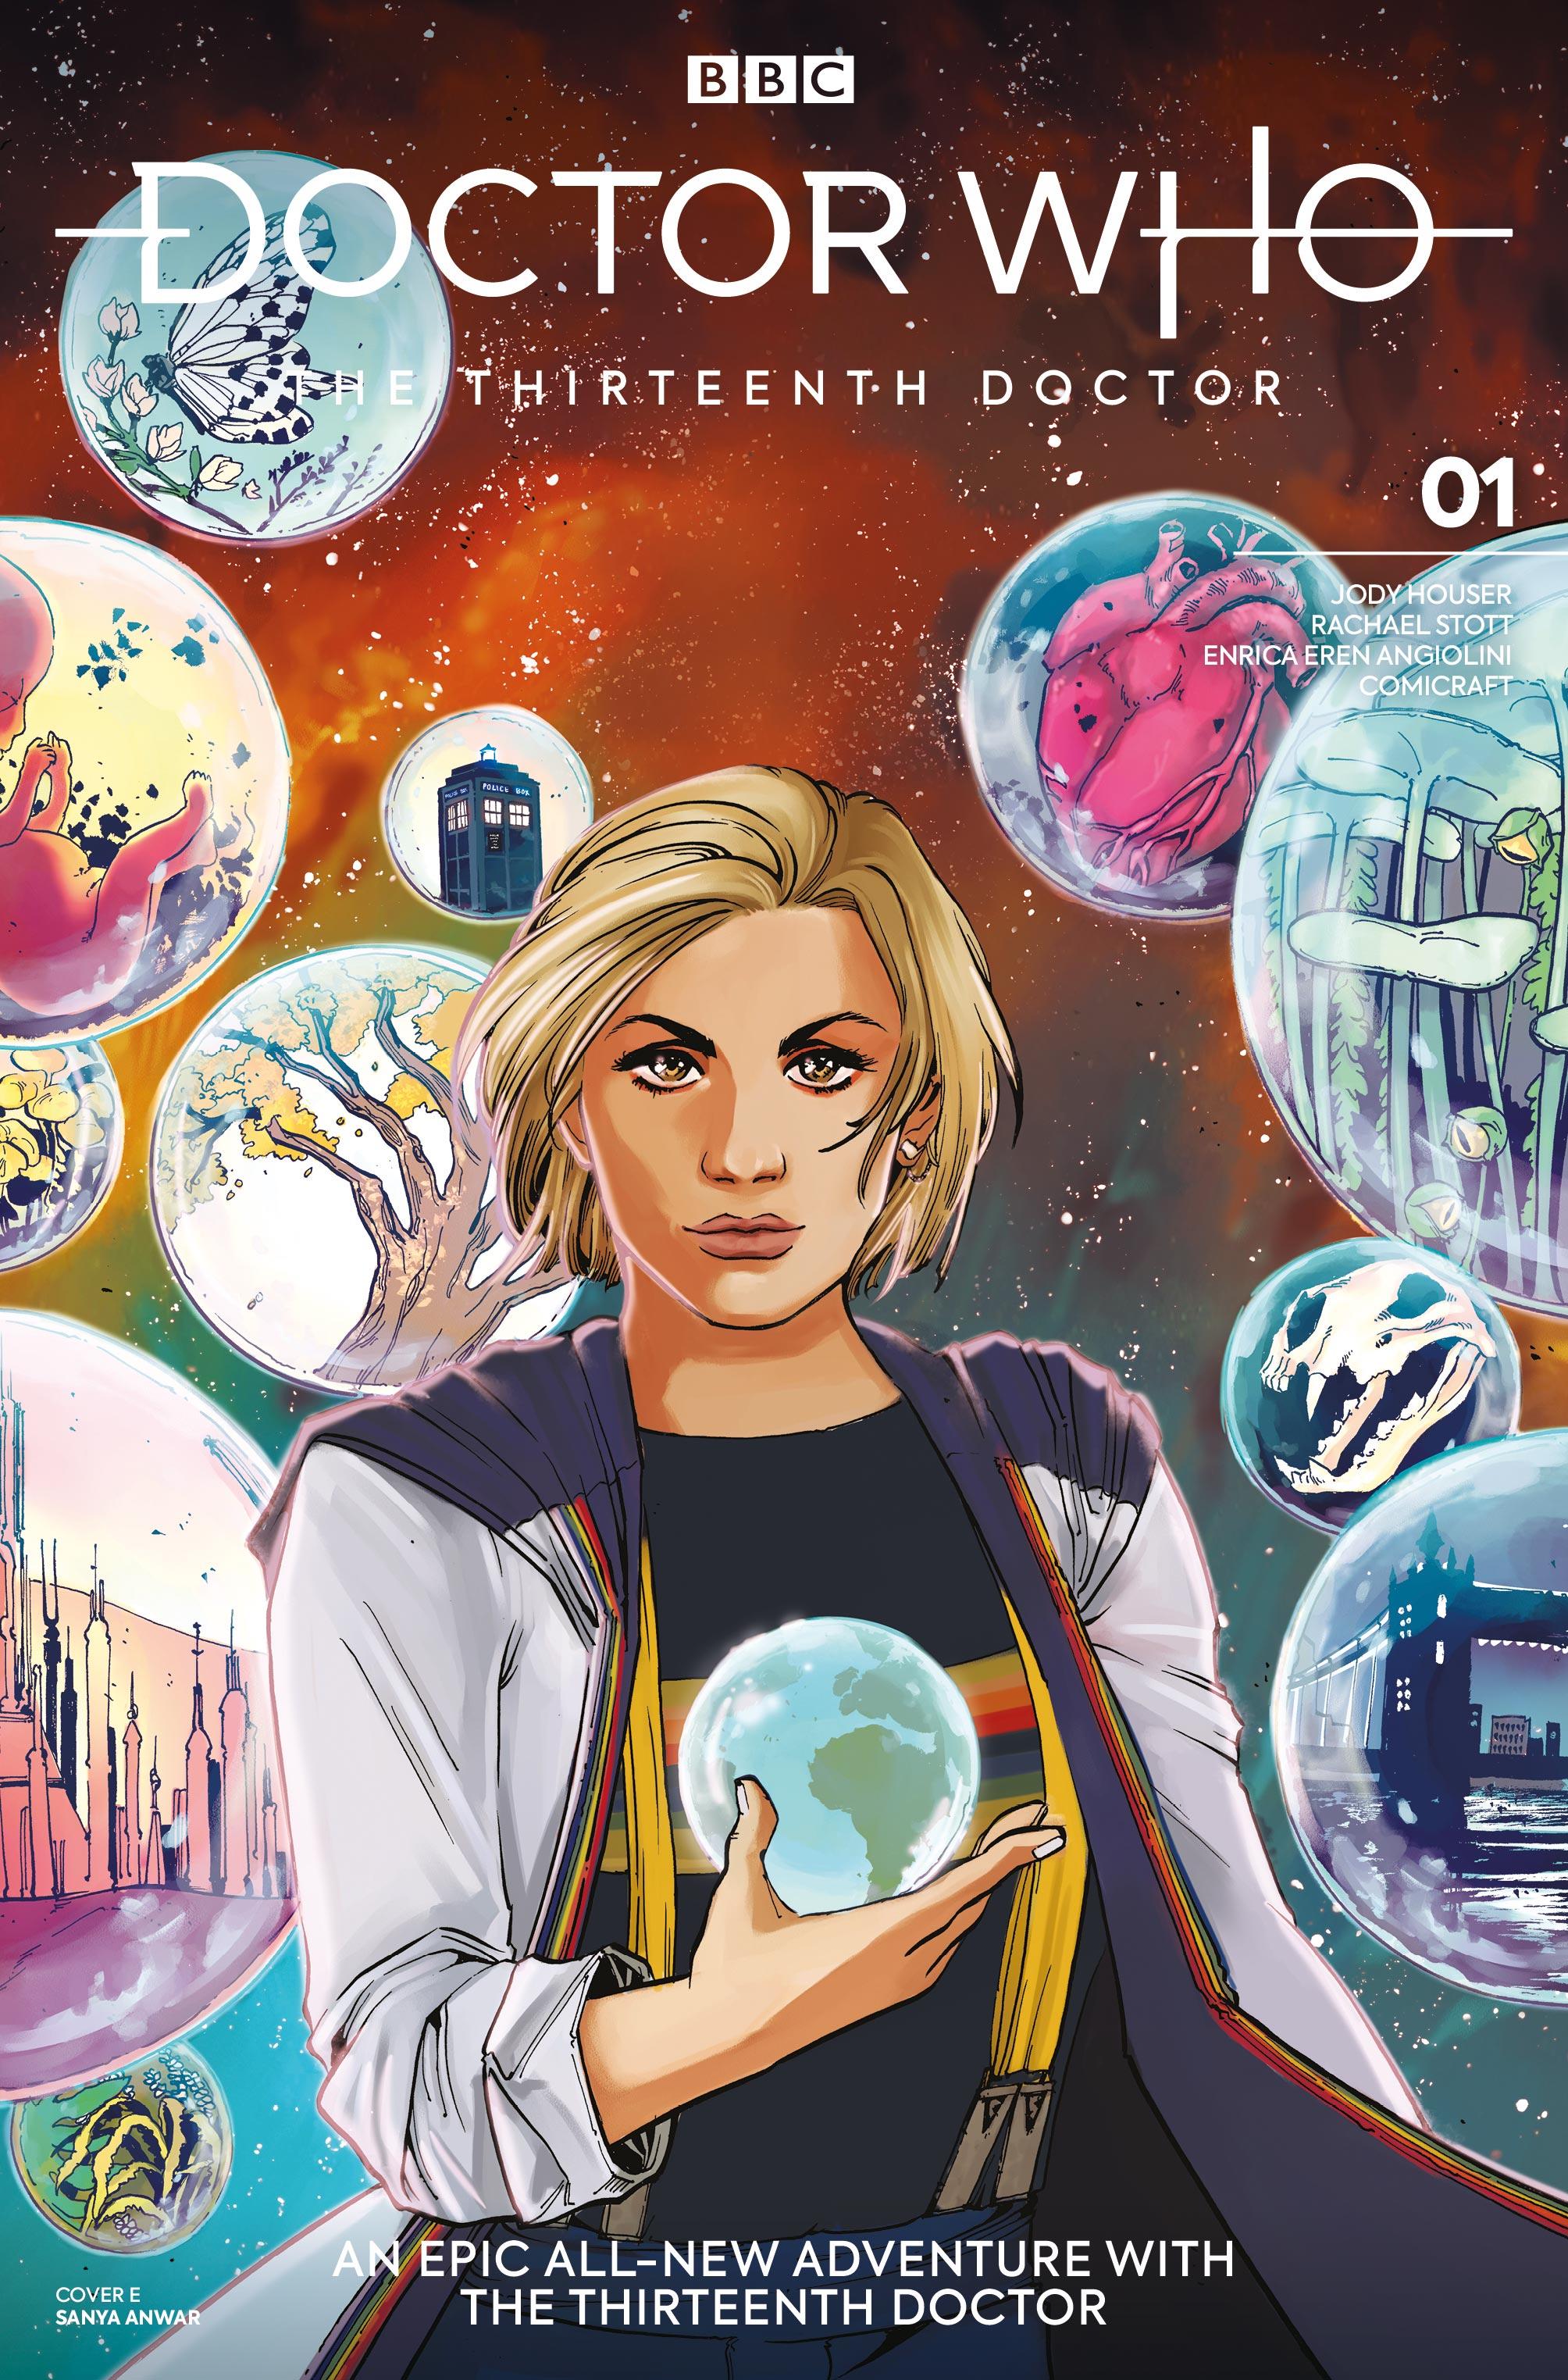 Doctor Who: Thirteenth Doctor #1 - Sanya Anwar (Credit: Titan )